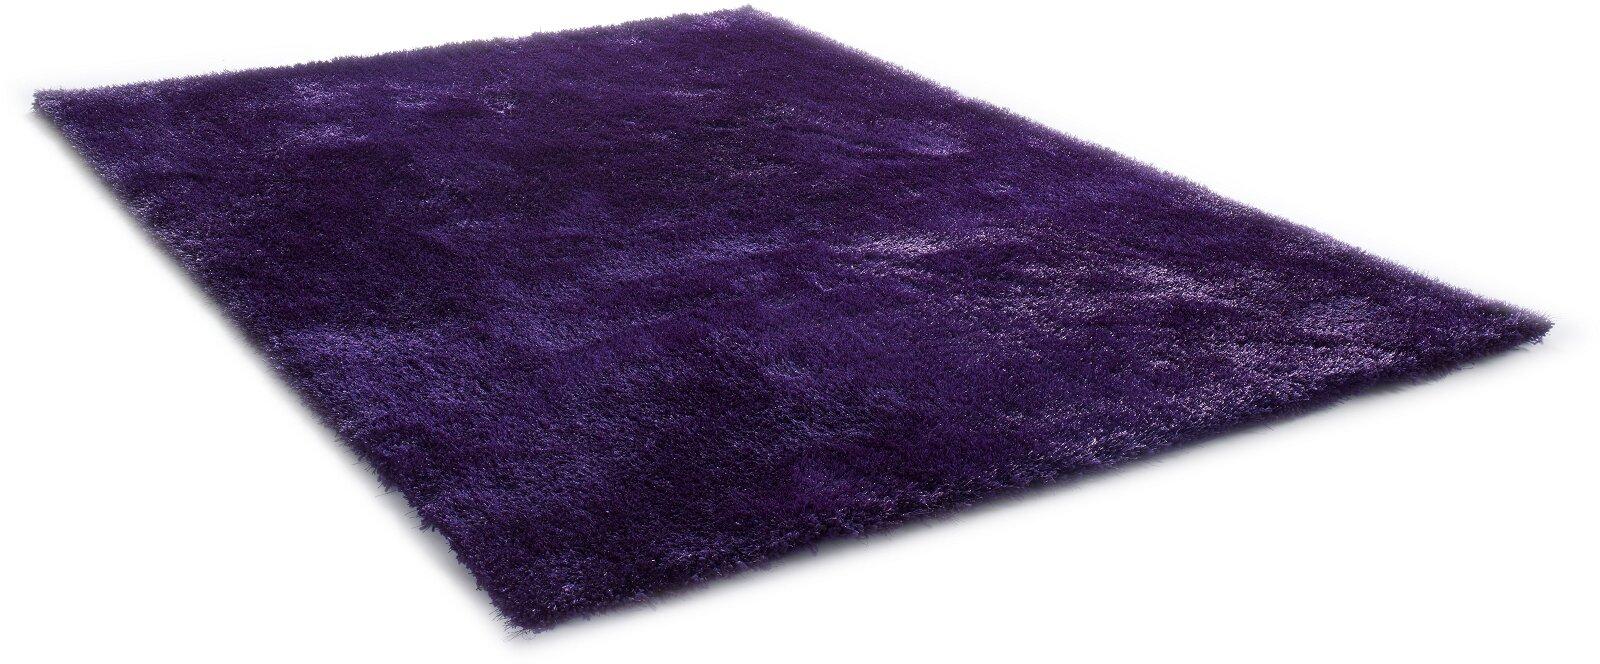 tom tailor teppich soft in lila bewertungen. Black Bedroom Furniture Sets. Home Design Ideas